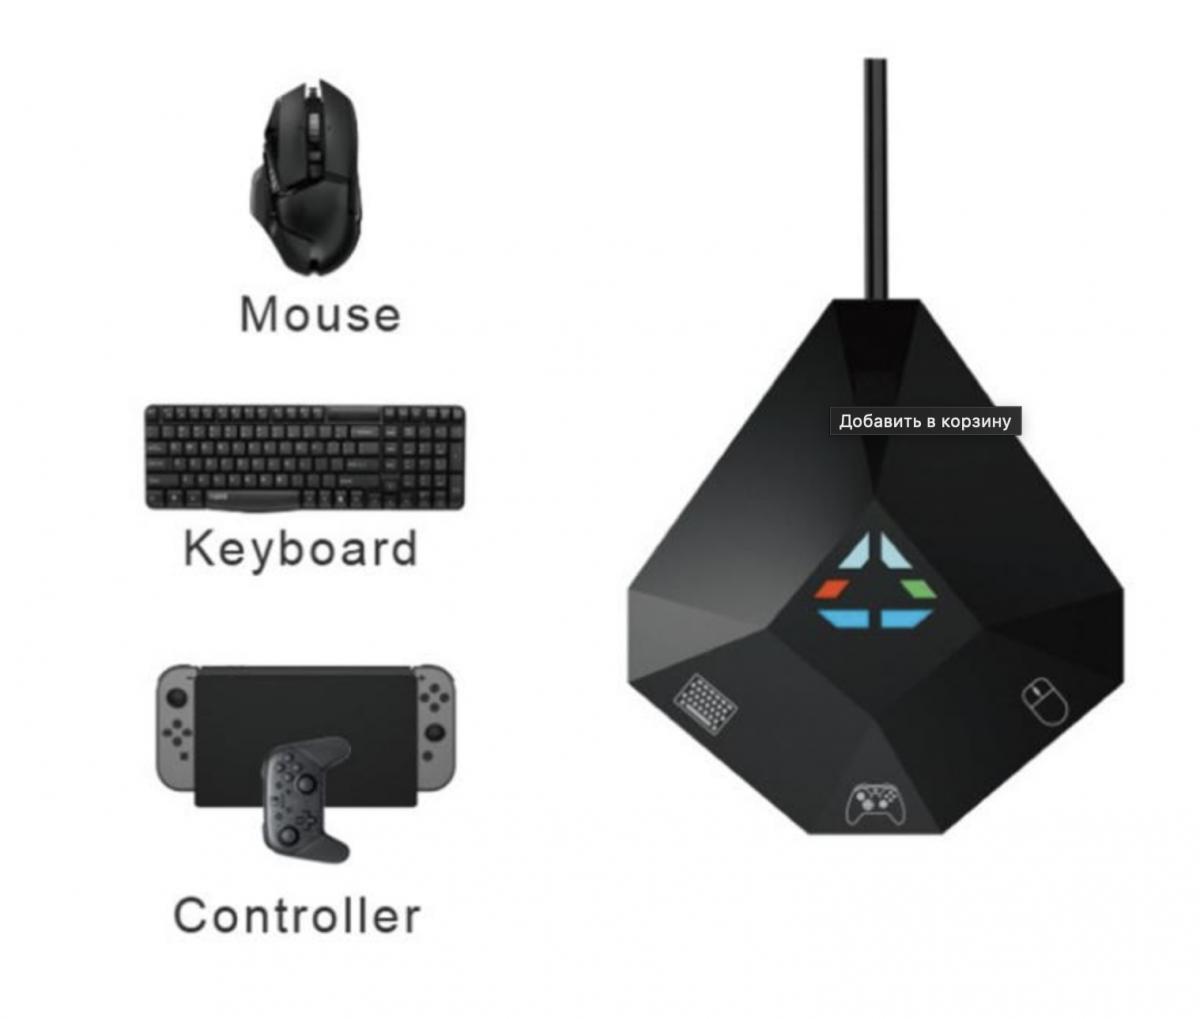 Преобразователь клавиатуры и мыши для Nintendo Switch, переходник, адаптер для Нинтендо свитч Fortnite, Wolfenstein, Doom, Splatoon